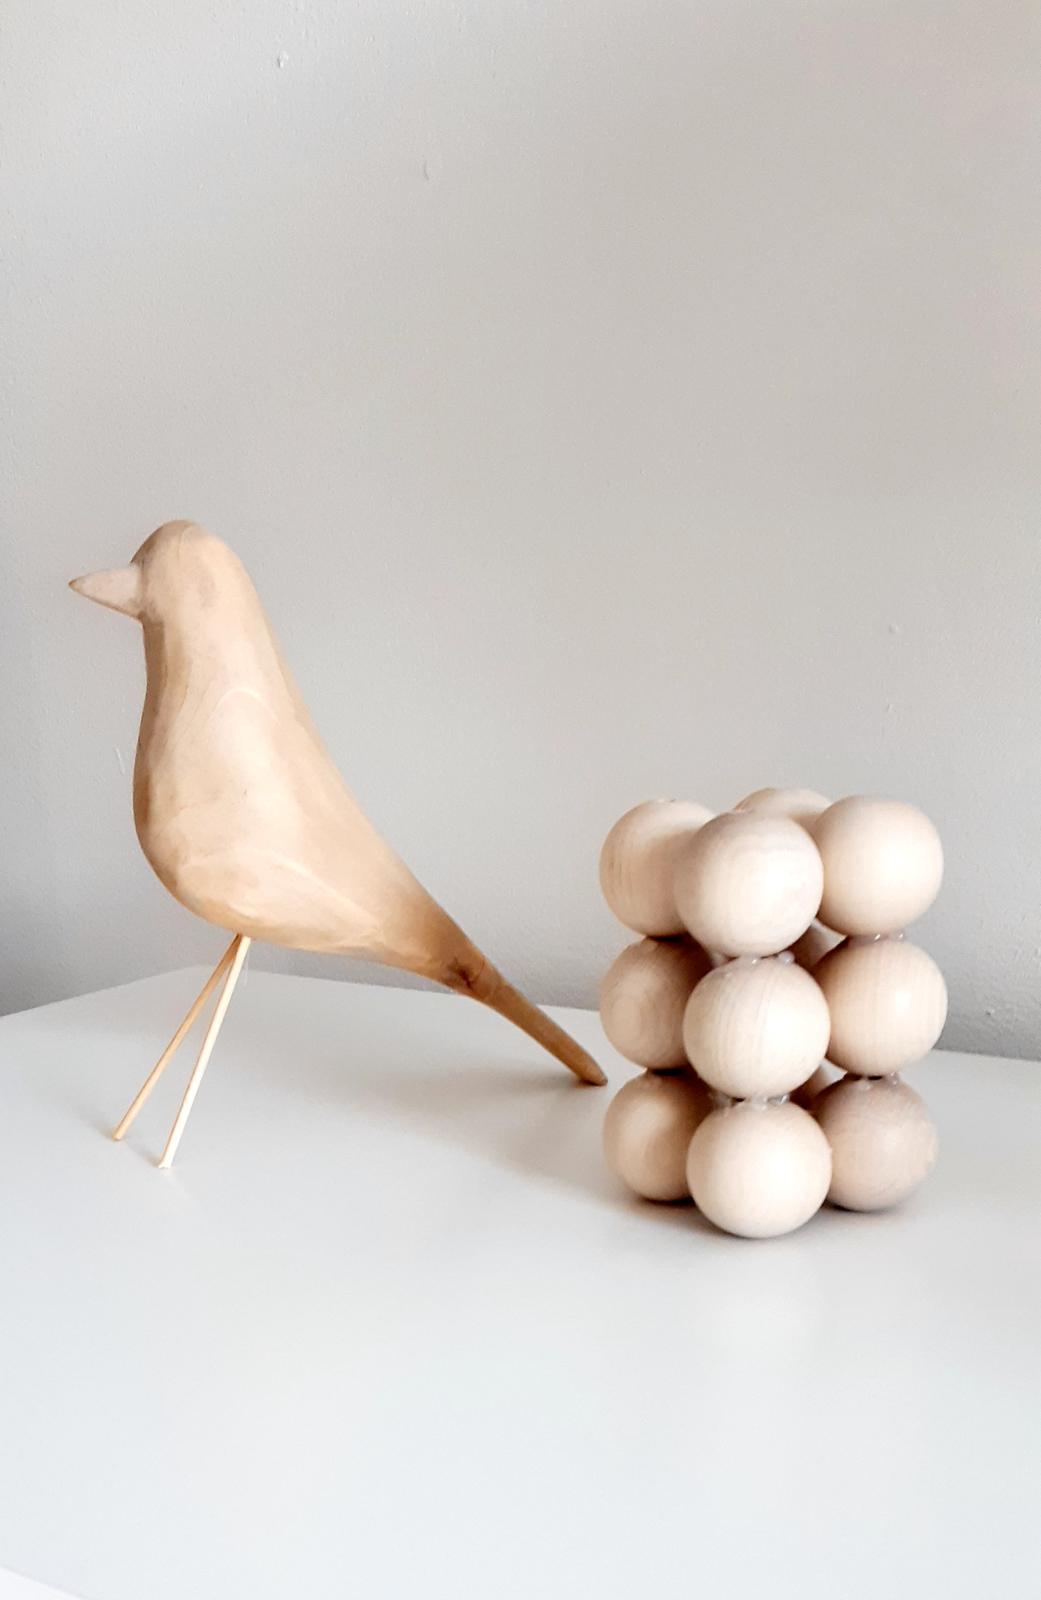 Drevené vtáky - Obrázok č. 1